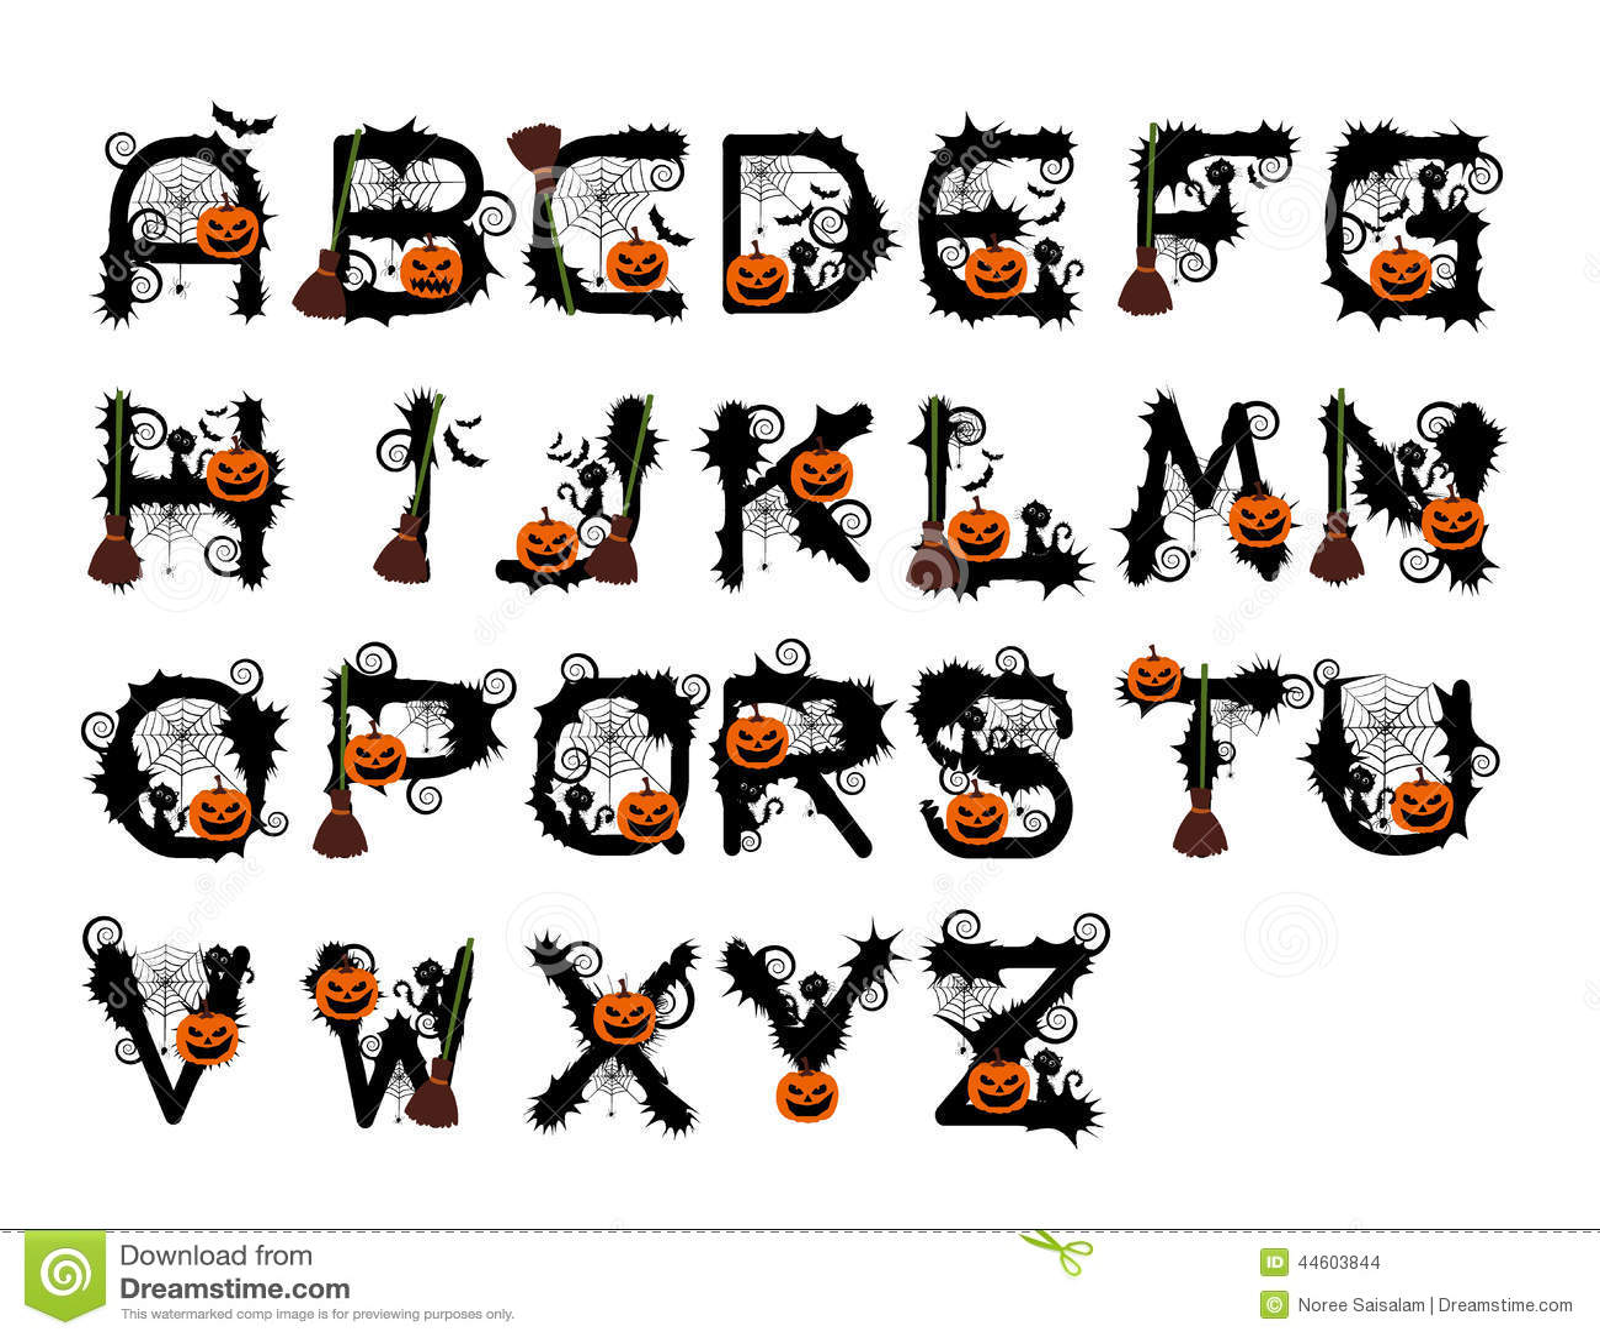 Halloween Font Design Vector Stock Vector - Illustration of pumpkin ...